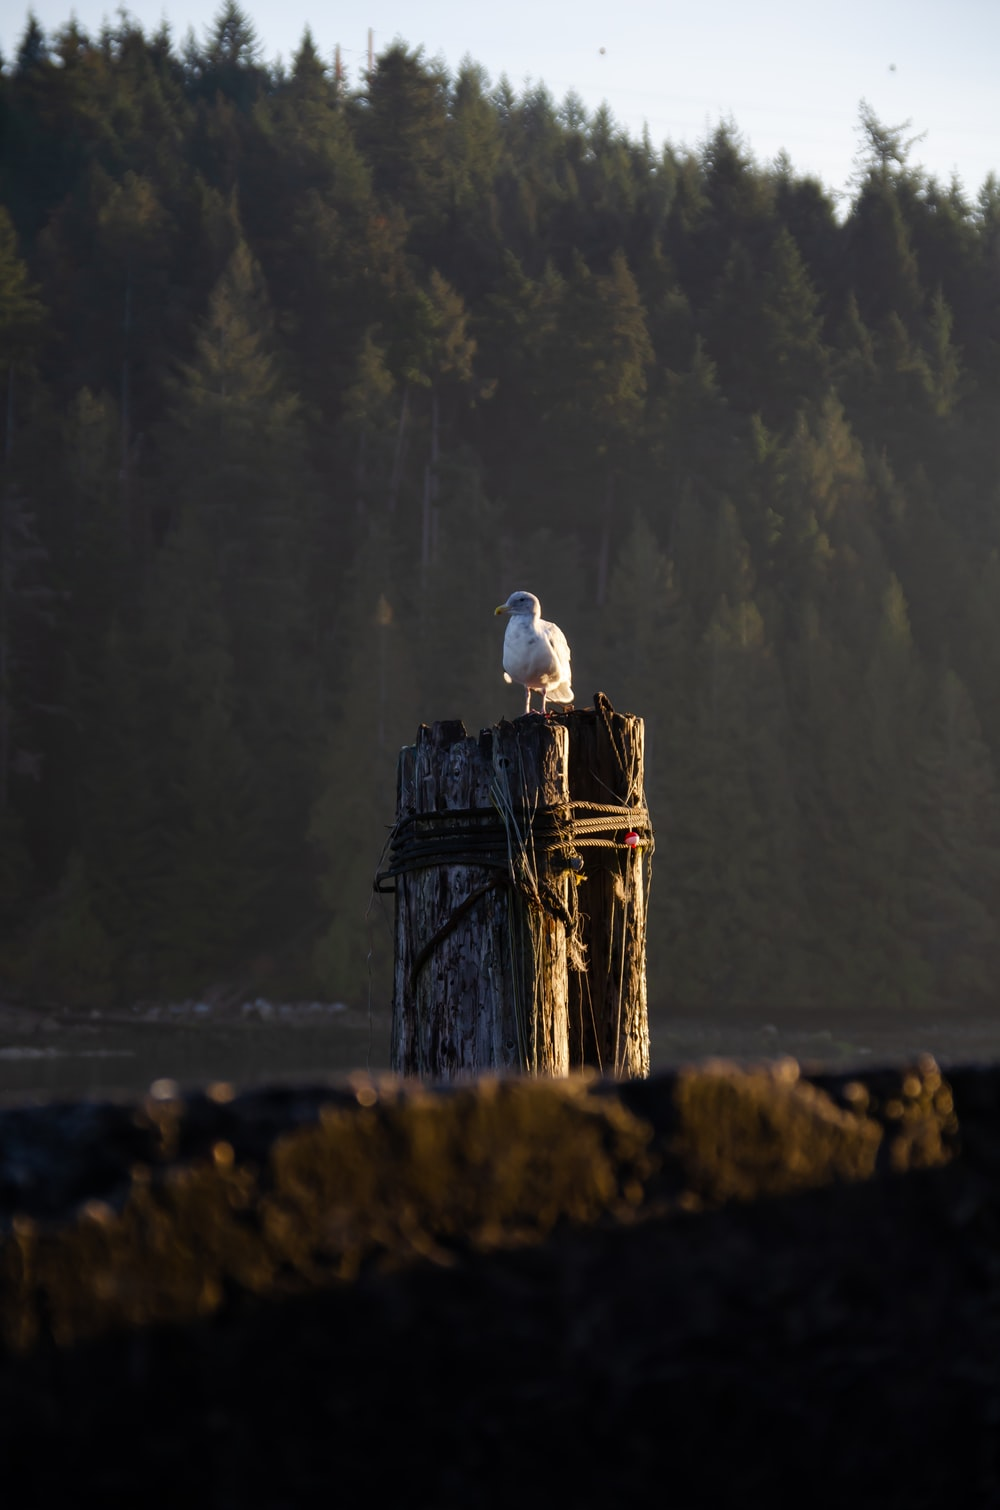 white bird on brown wooden post during daytime